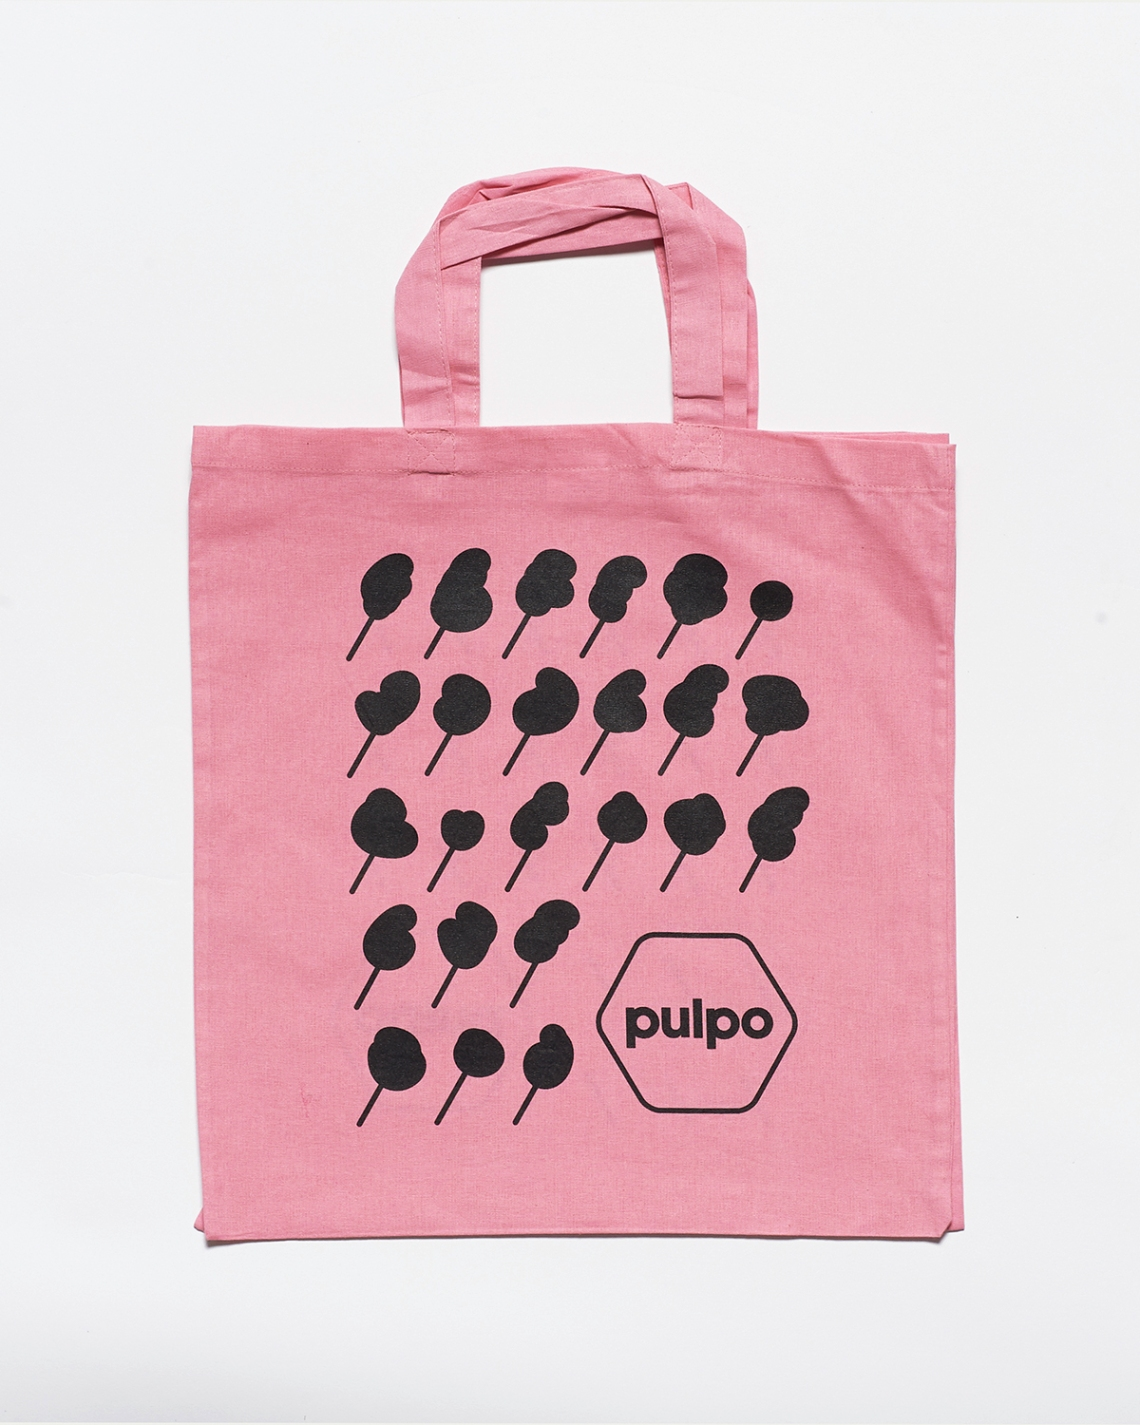 sign_pulpo005